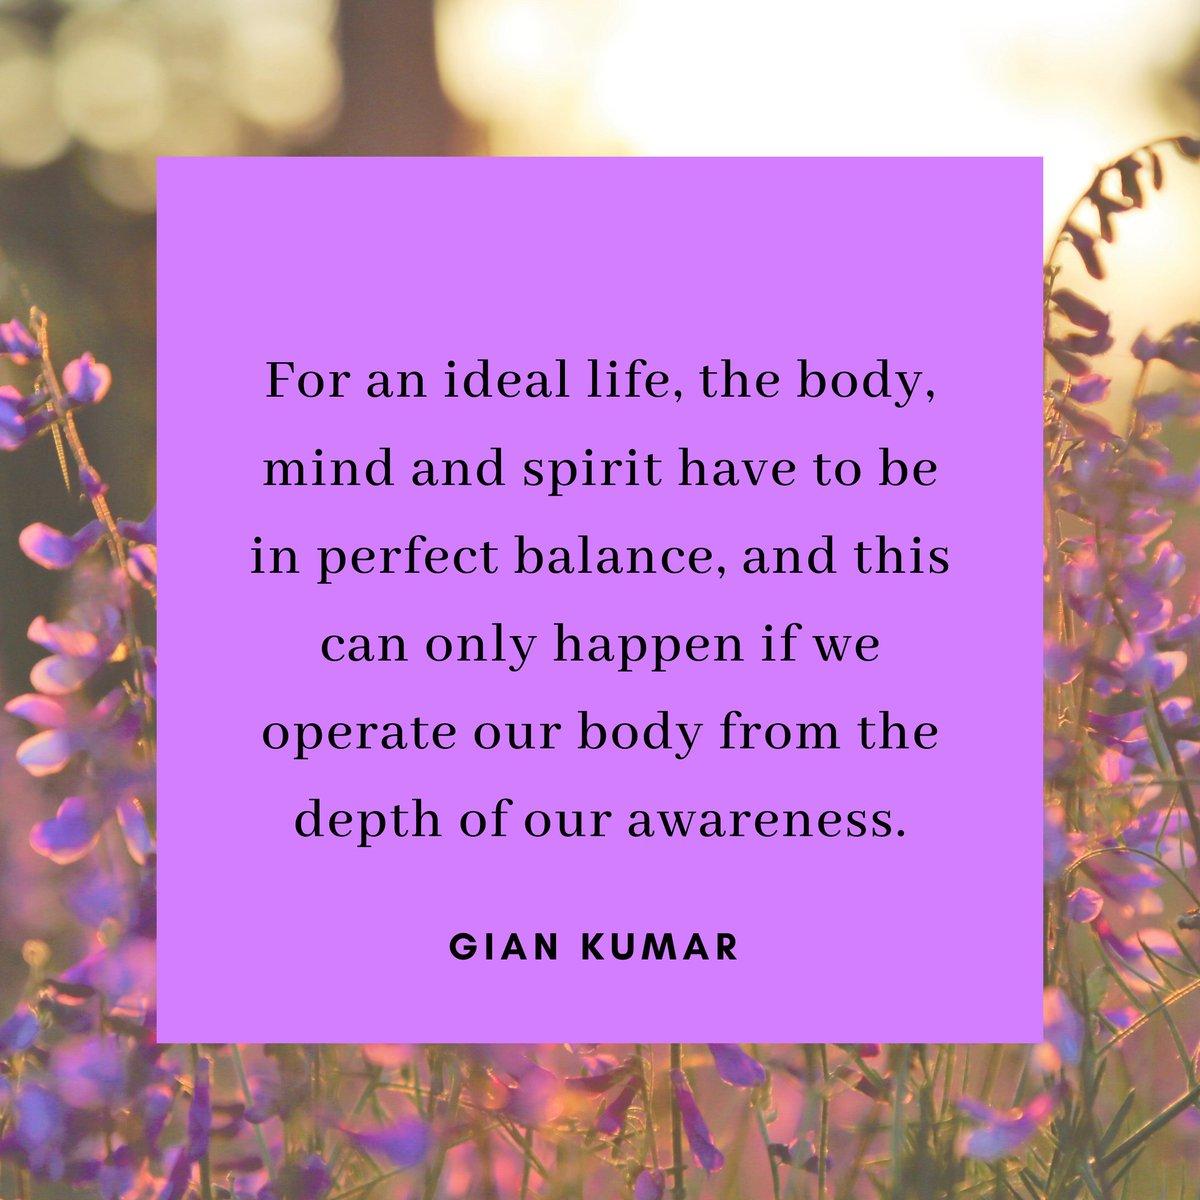 Monday Motivation! . . . . . #giankumar #spiritualauthor #spiritualist #spiritualpower #mustread #mindfulness #mindfulnessmatters #ego #mind #balance #harmony #discipline #hayhouse #hayhouseindia #control #bookstagrampic.twitter.com/6qANS79CA1